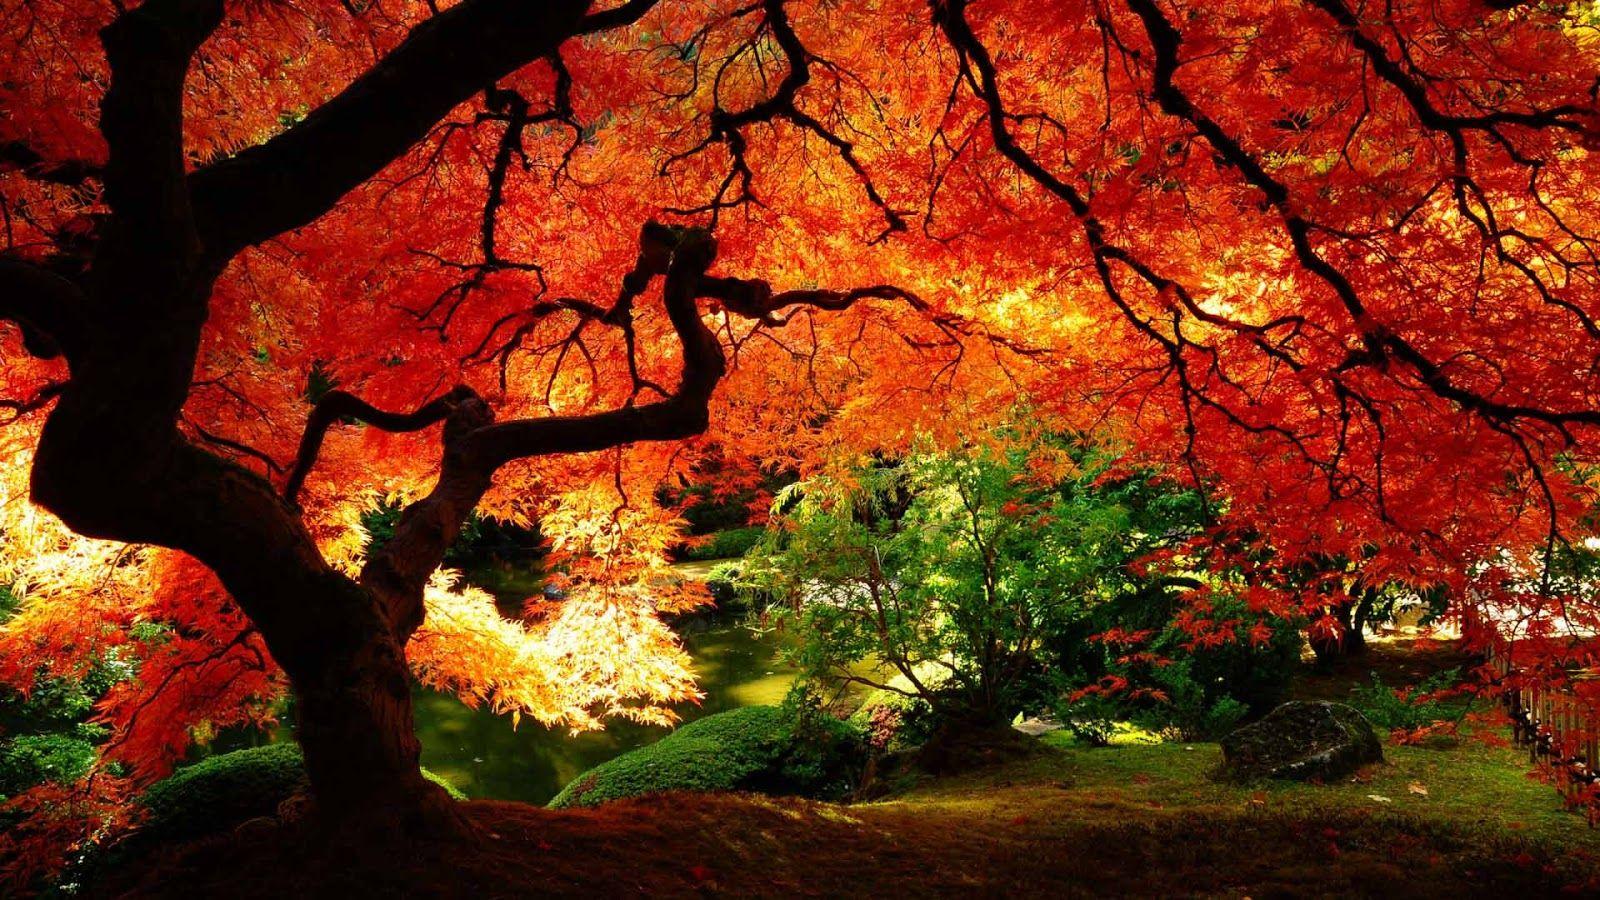 Free Download Hd Screensavers Tracy Morgan Landscape Wallpaper Fall Wallpaper Scenery Wallpaper